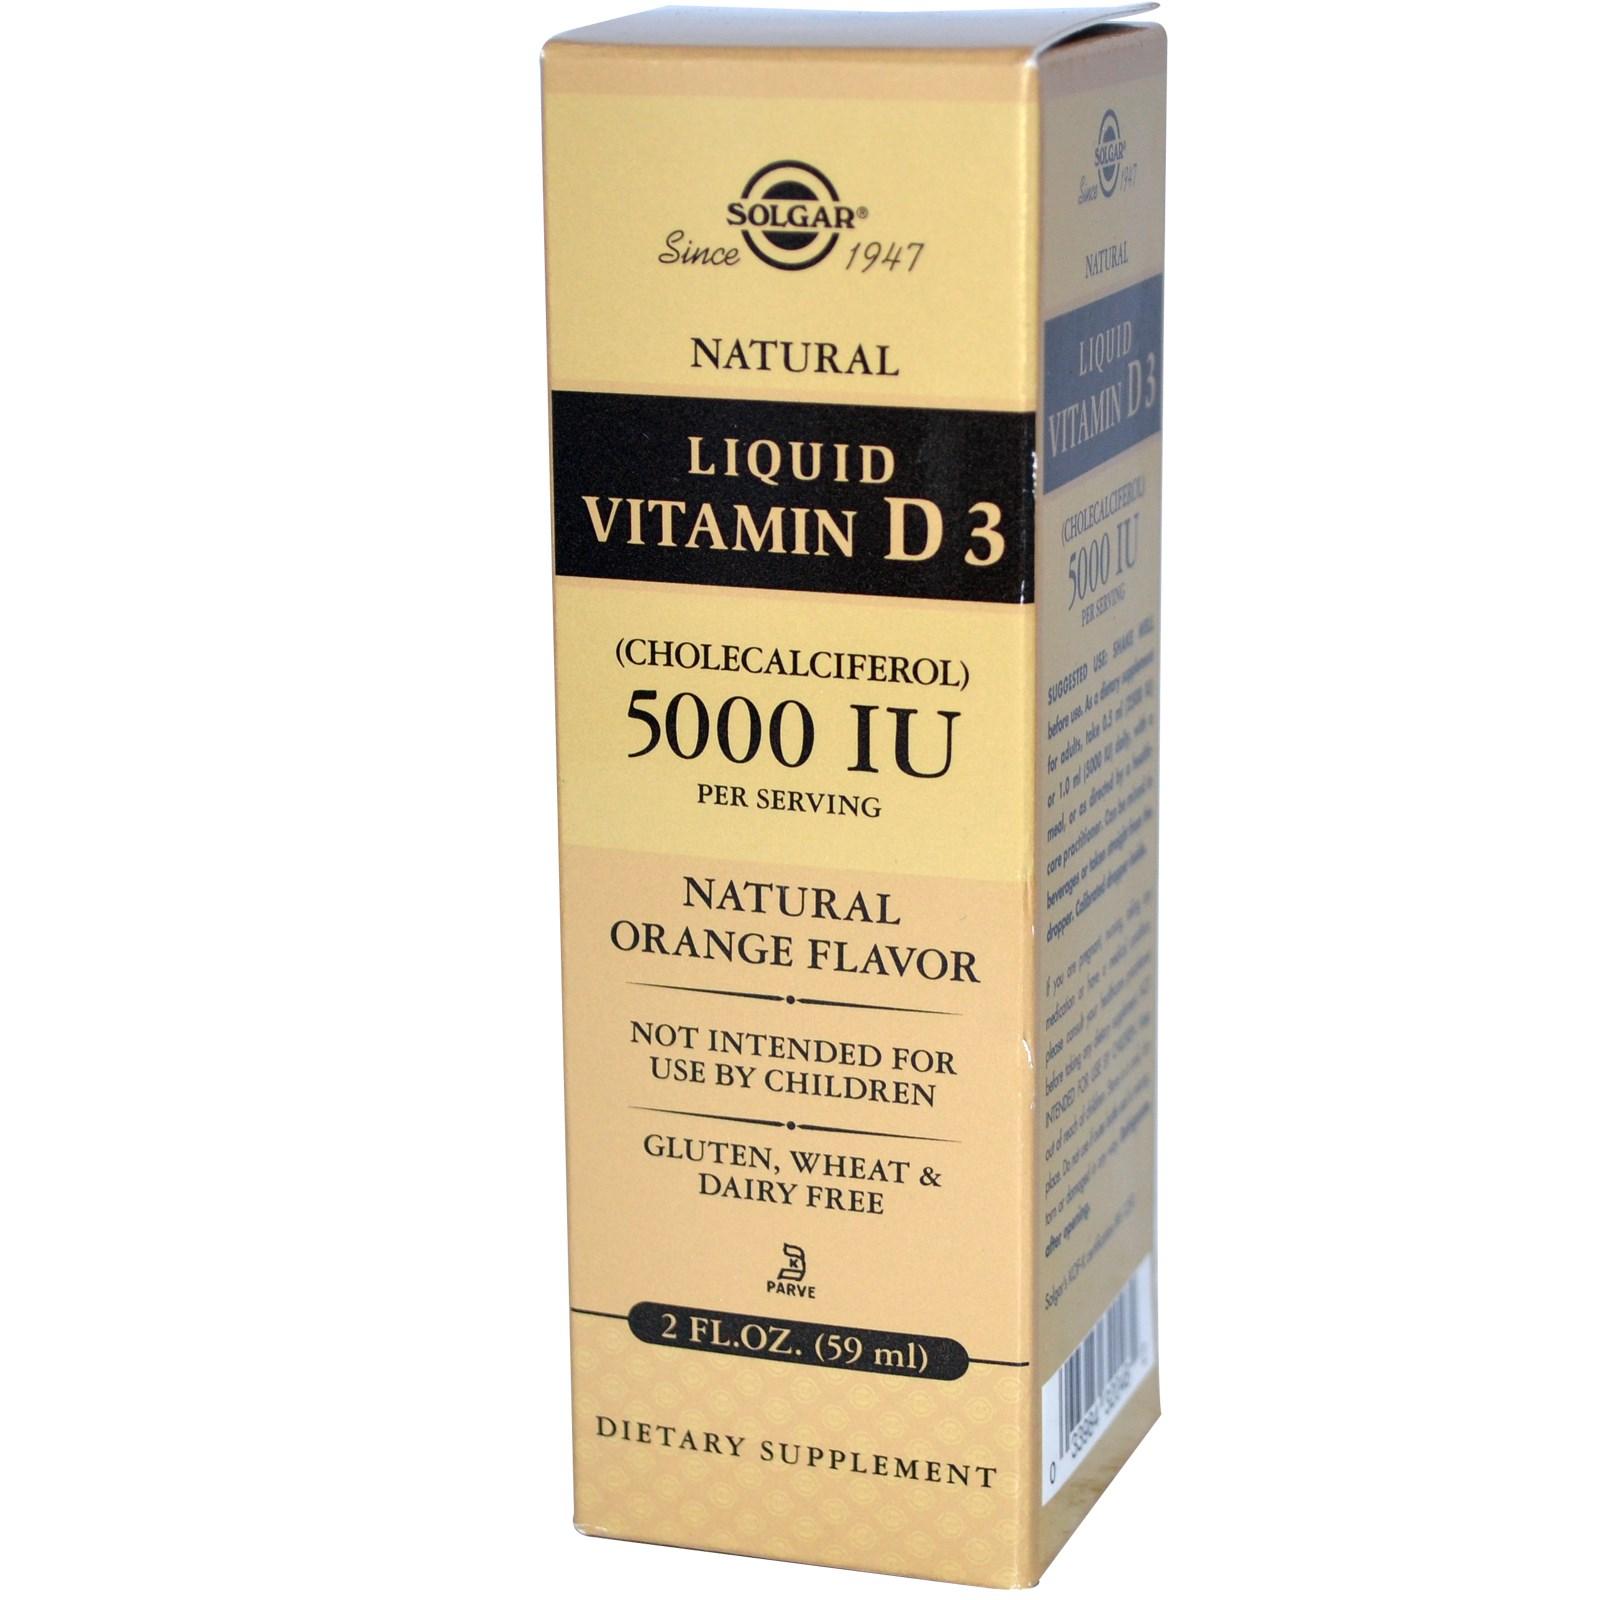 Жидкий витамин D3 (59 мл) от Solgar